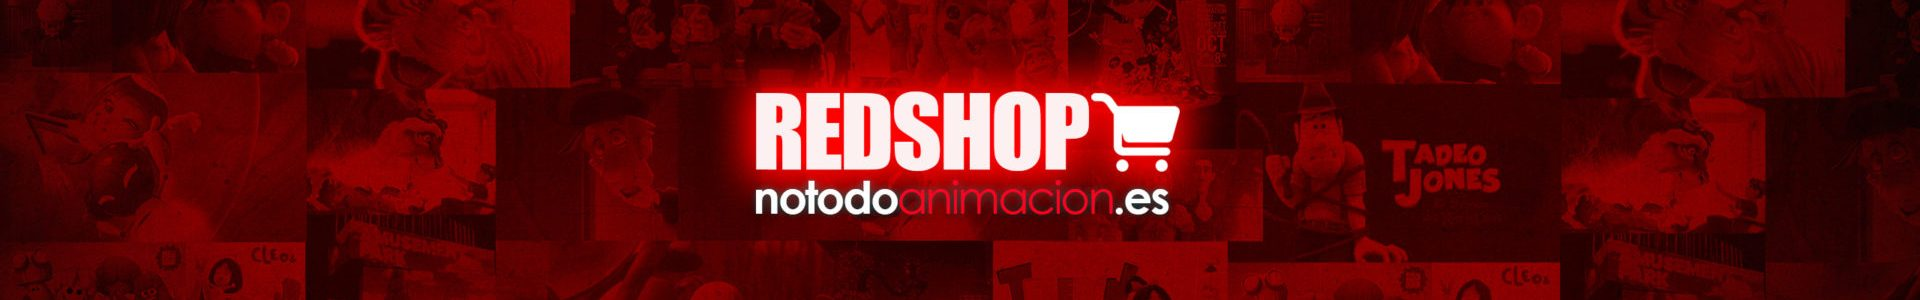 tienda online notodoanimacion